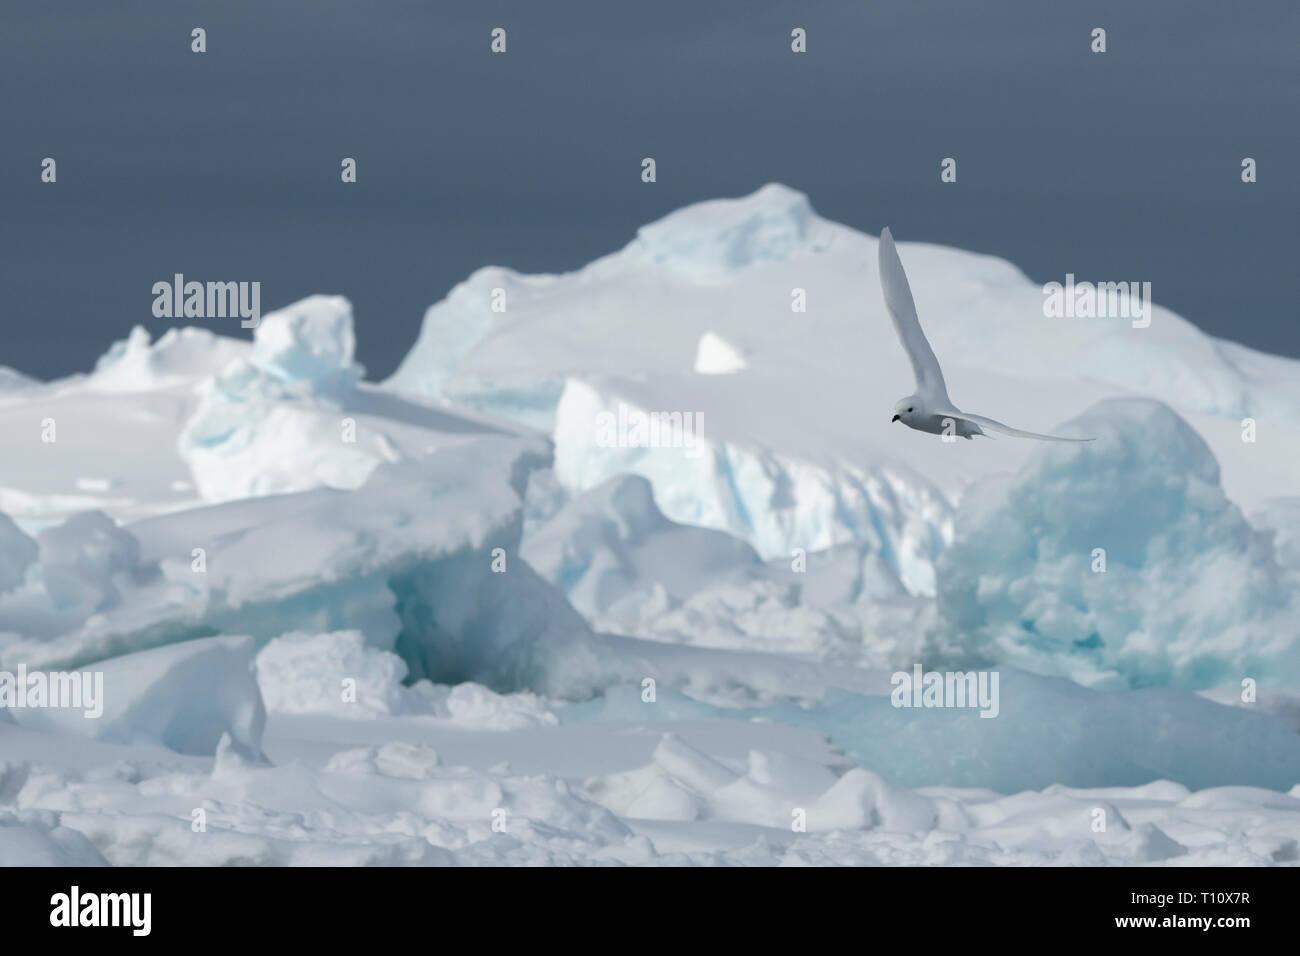 Antarctica, below the Antarctic Circle, Crystal Sound. Snow petrel (WILD: Pagodraoma nivea) in flight over icebergs. - Stock Image